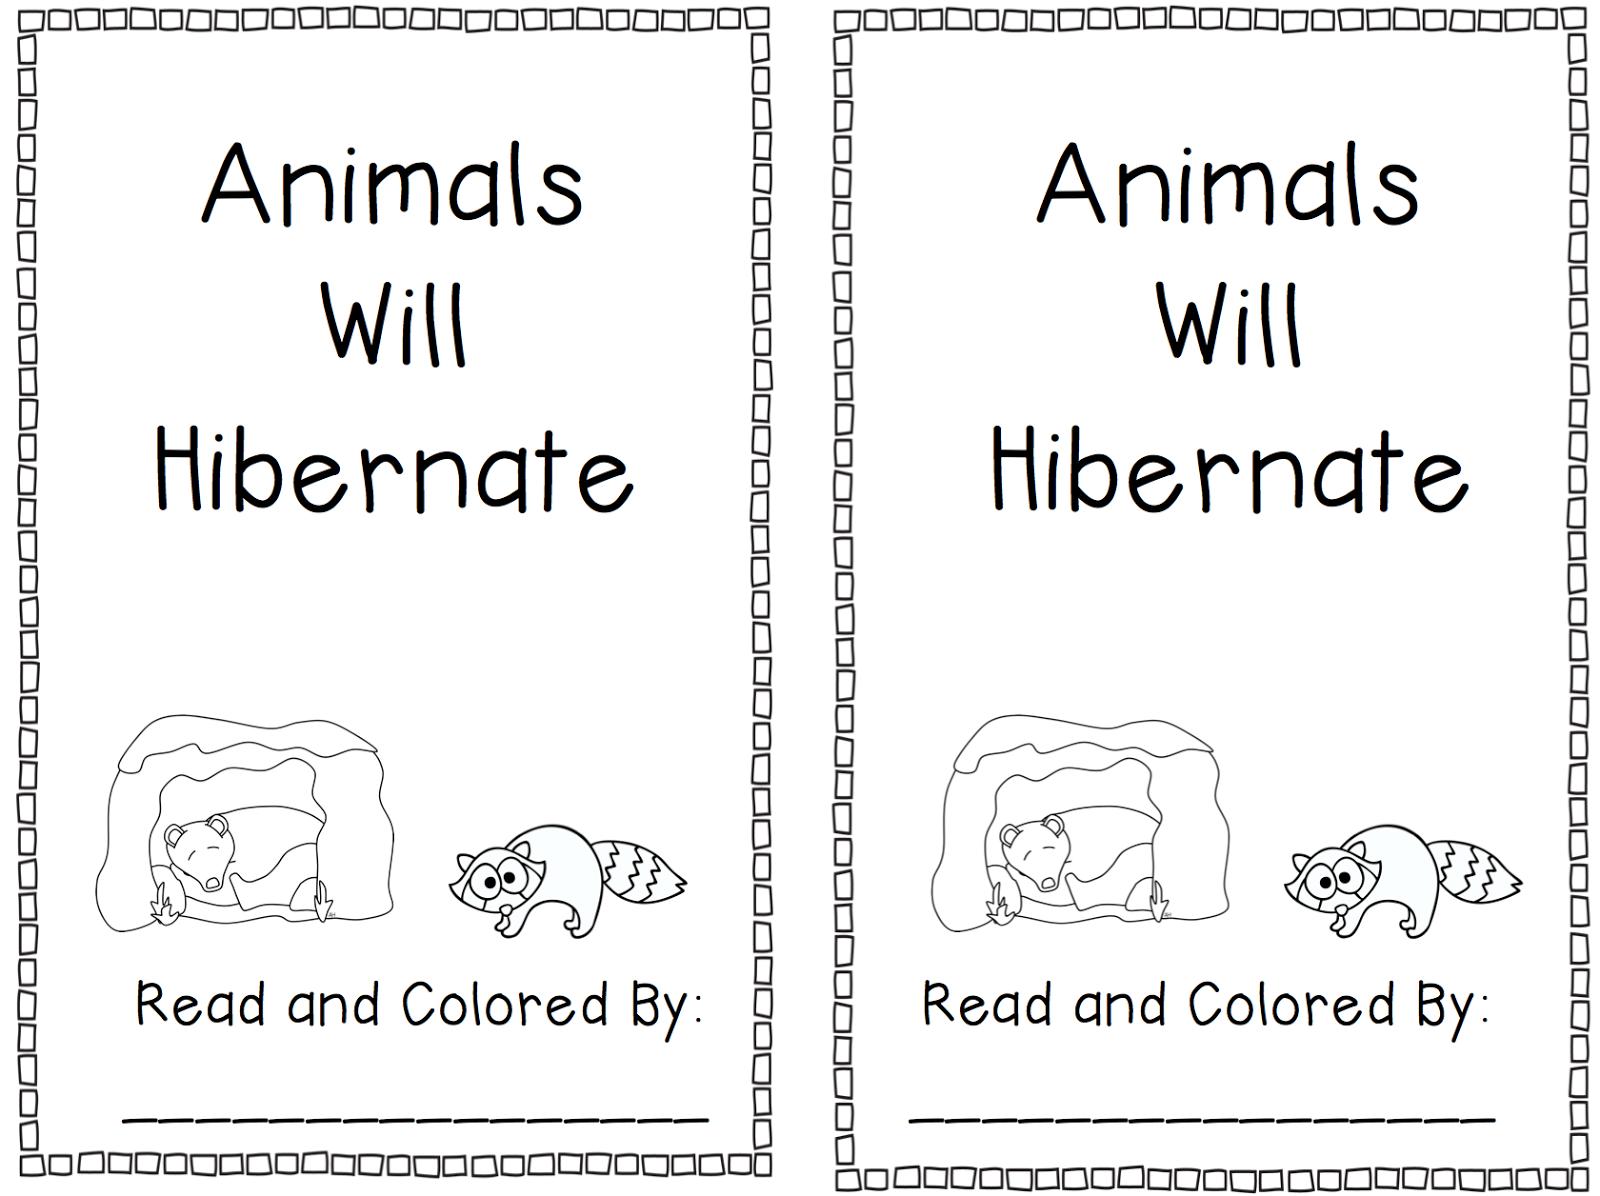 Worksheets Hibernation Worksheets hibernation coloring pages animals that hibernate preschool worksheets